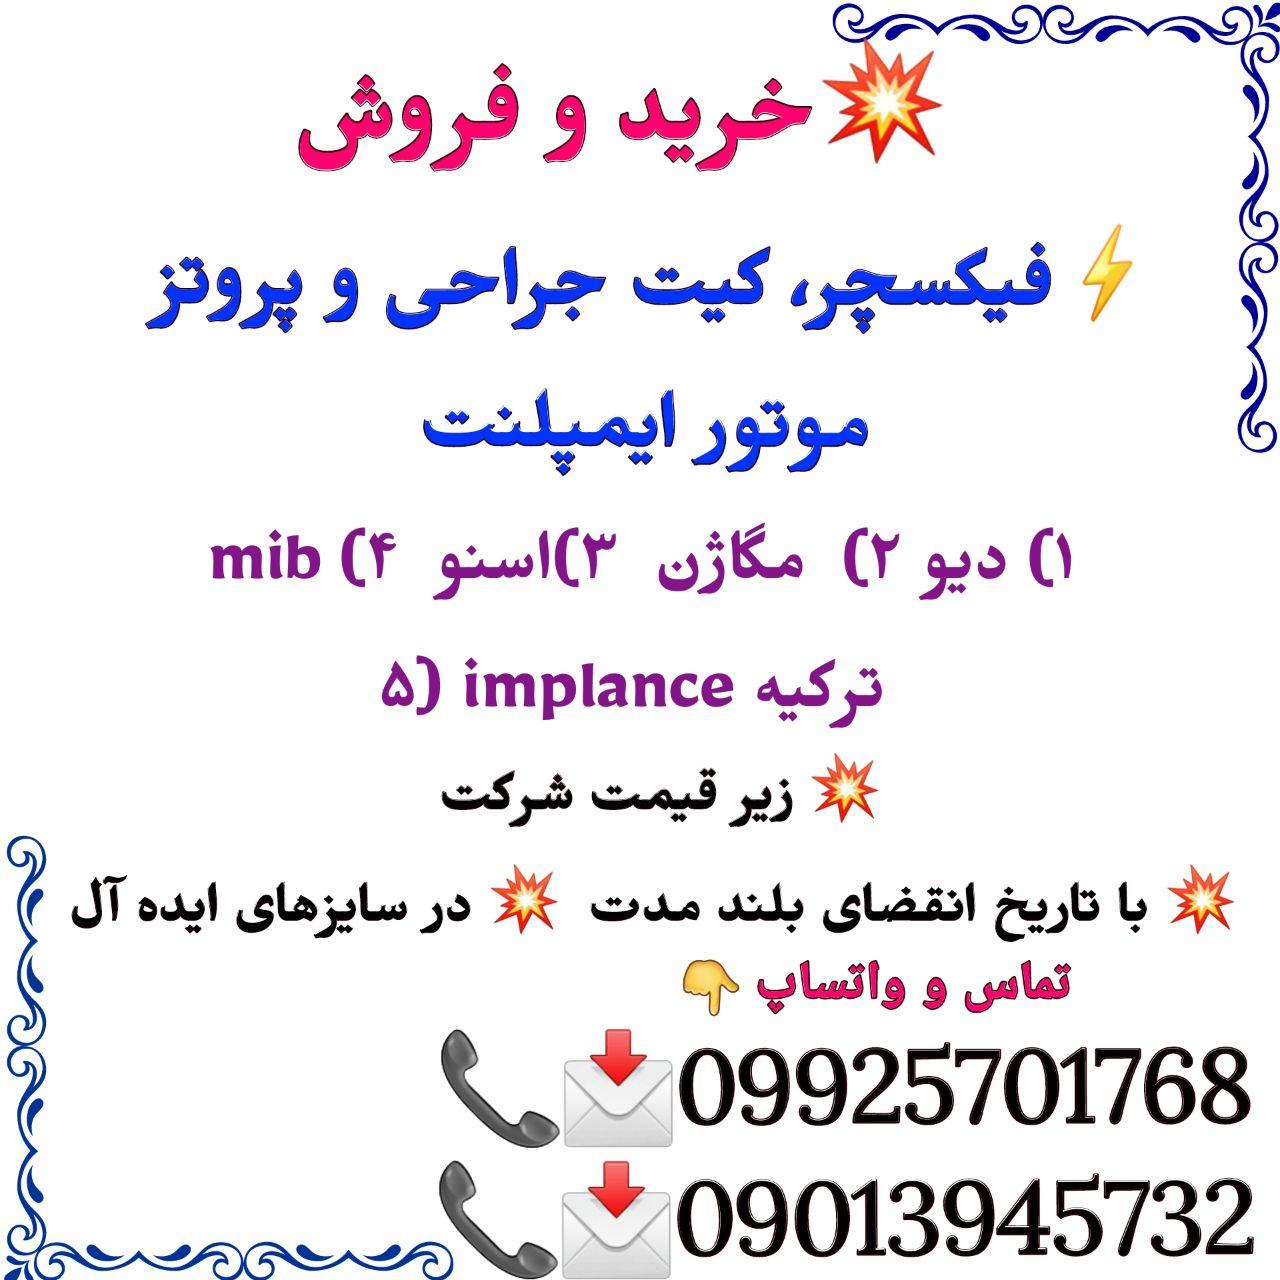 تهران: خرید و فروش، فیکسچر، کیت جراحی و پروتز،  موتور ایمپلنت